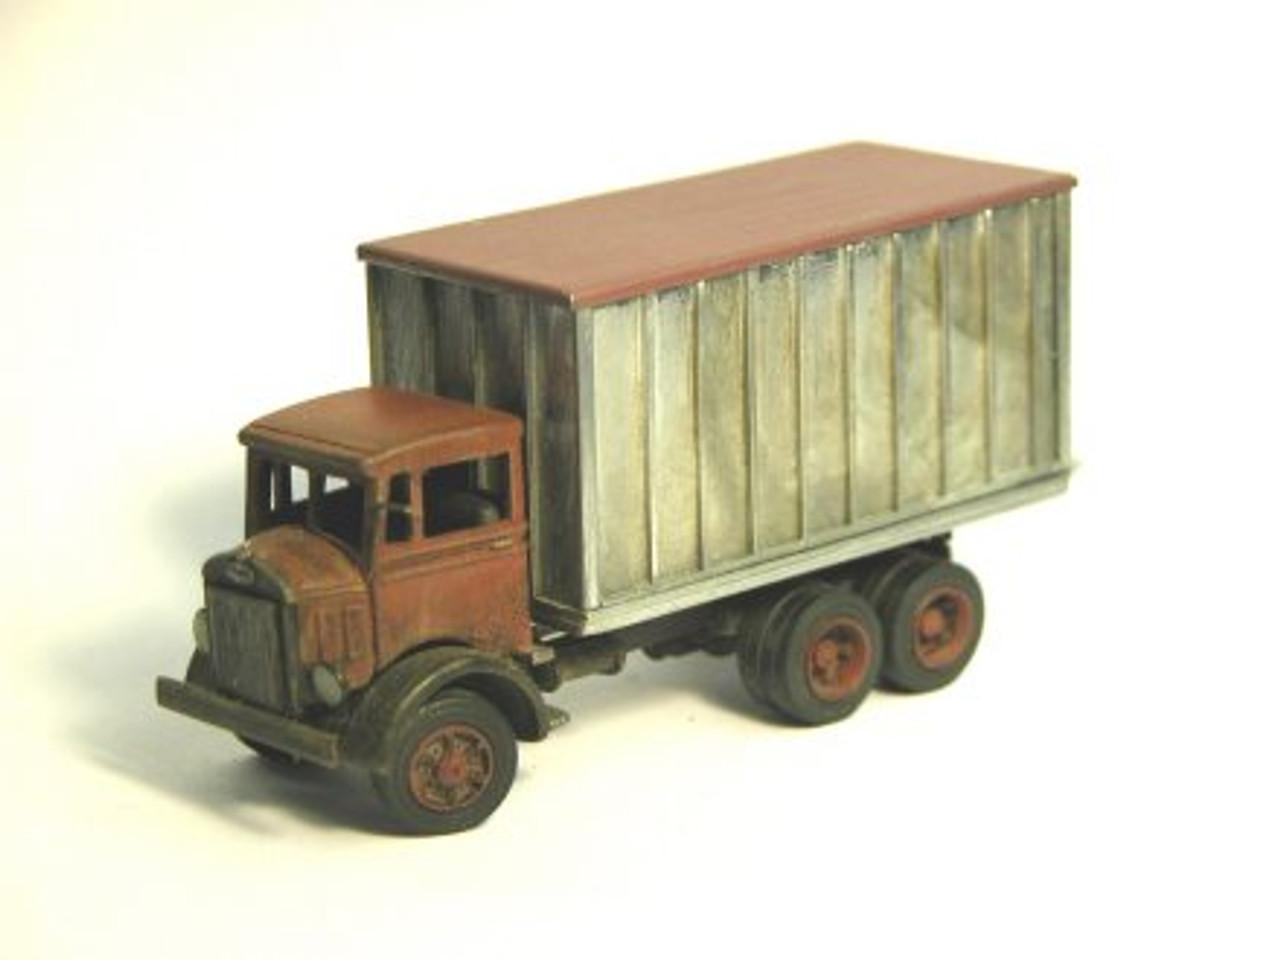 1933 Mack CJ Truck with Van Body Kit